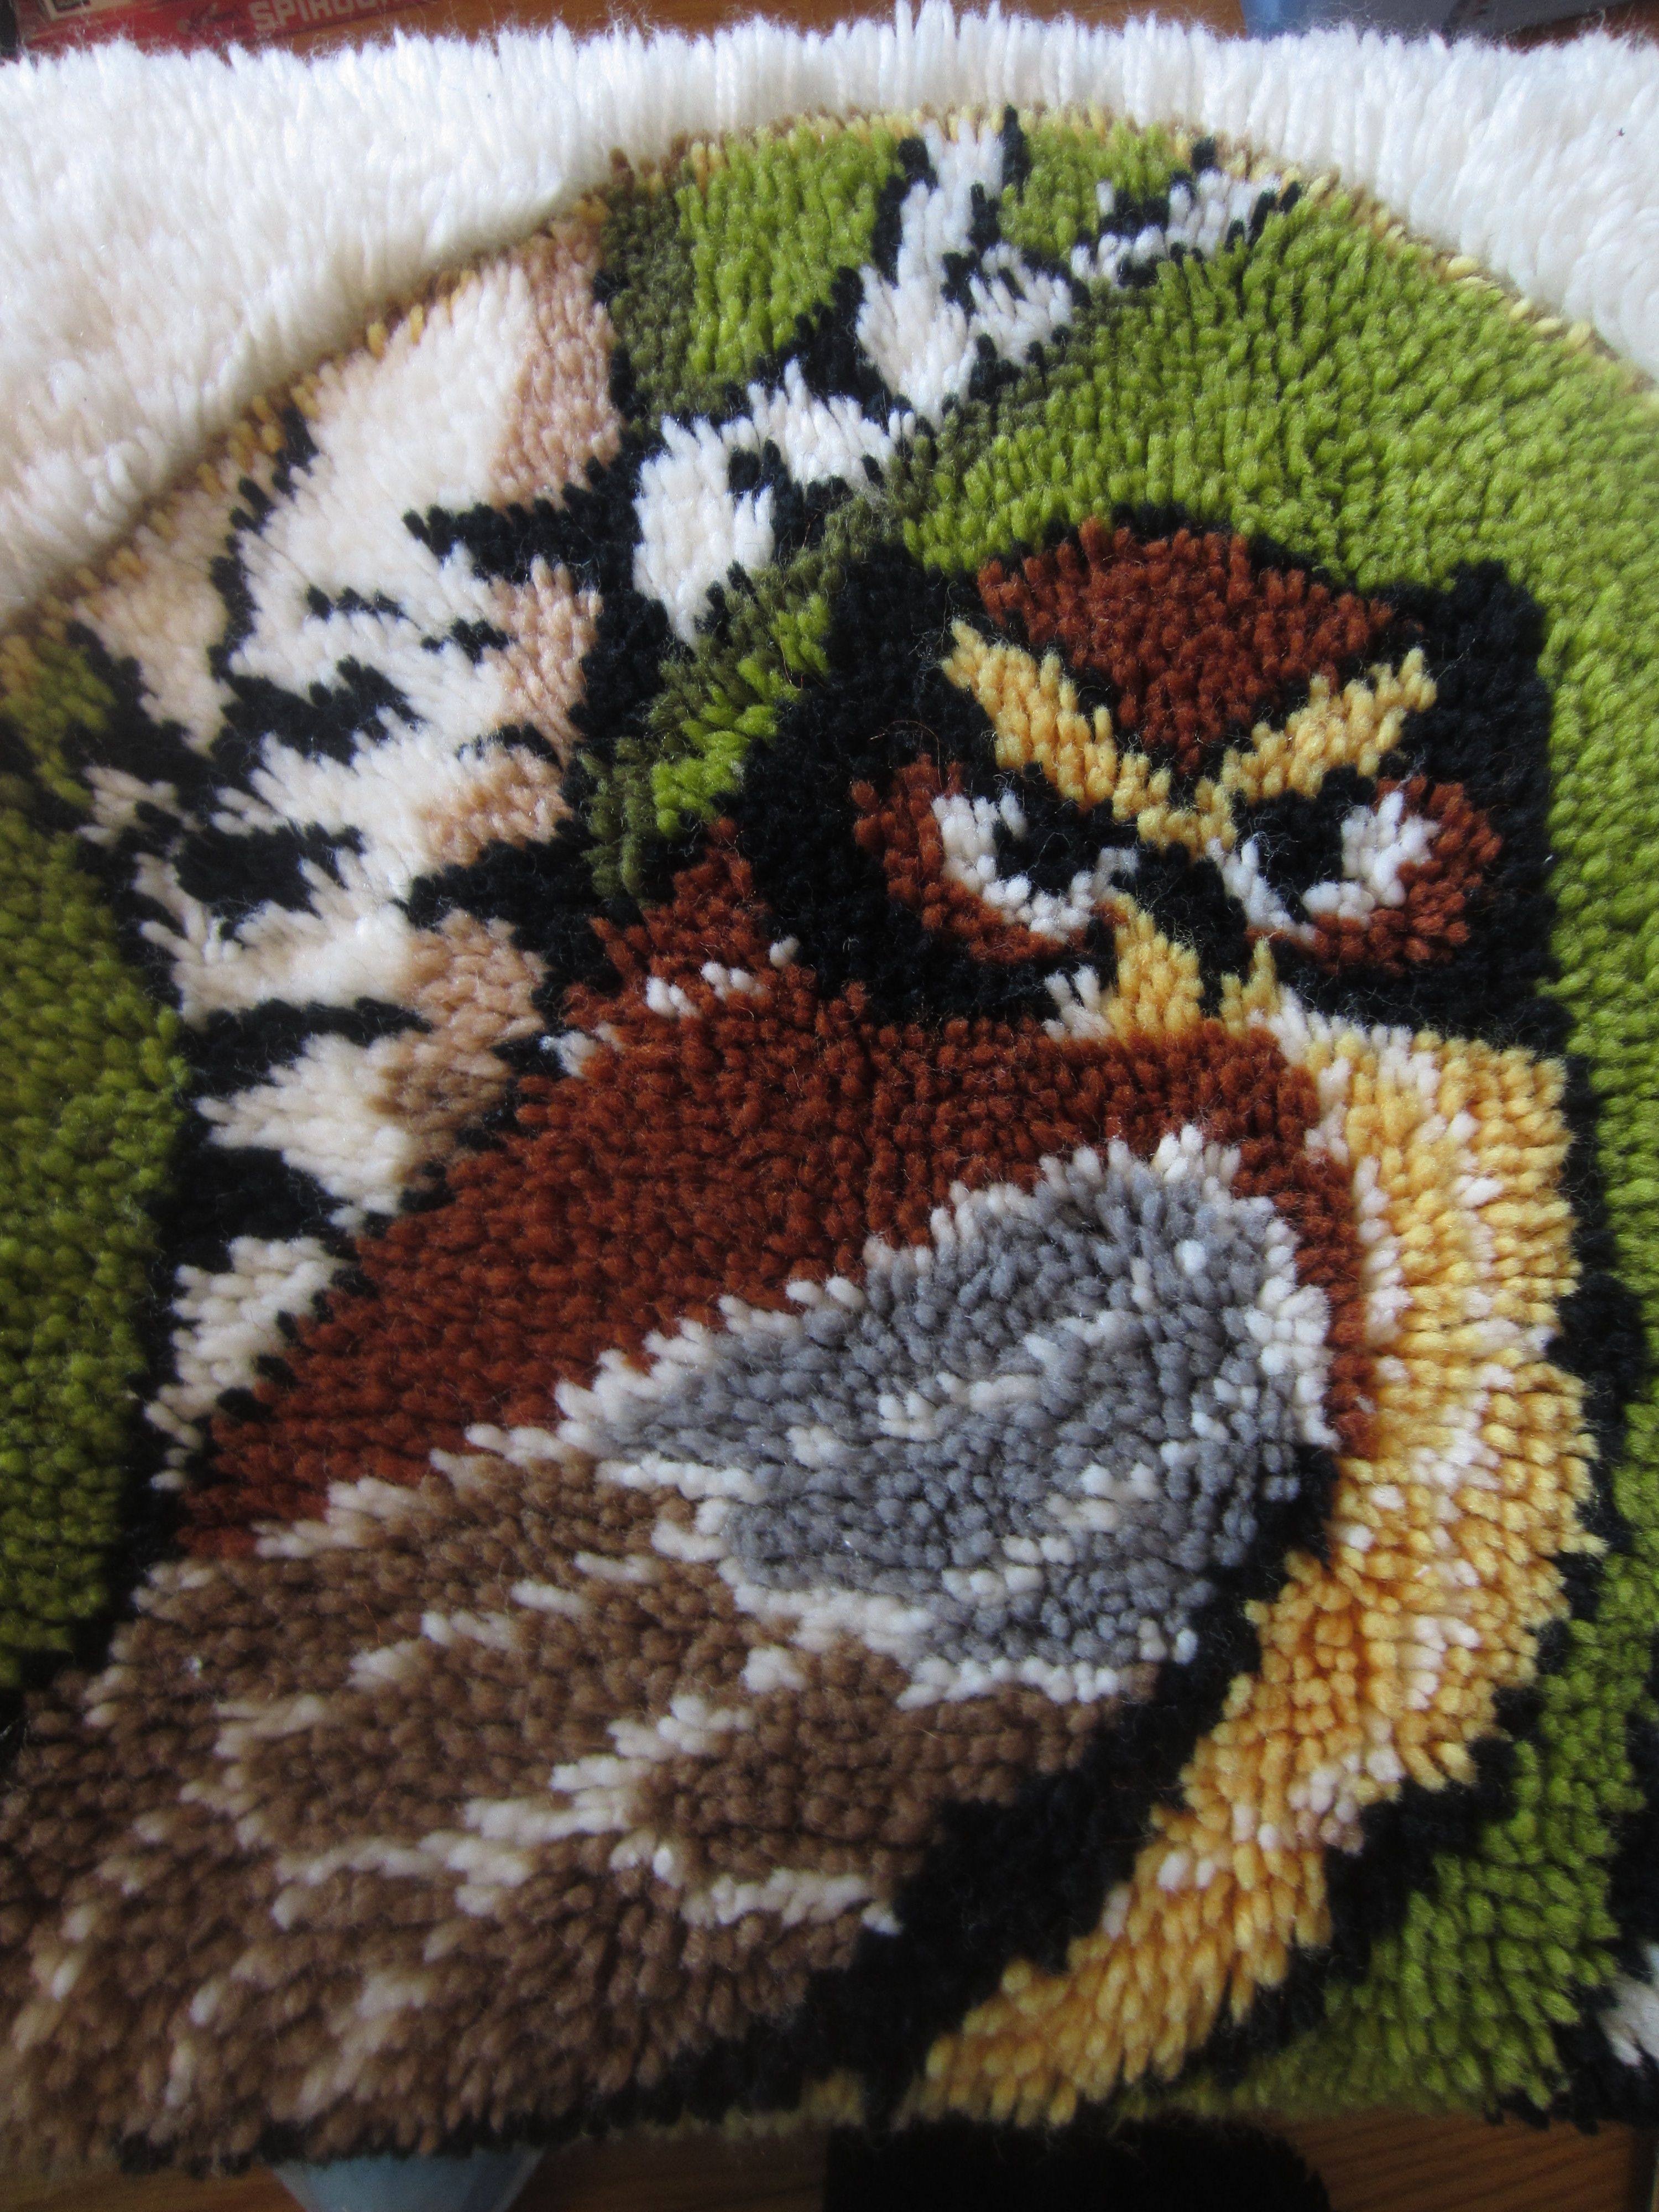 Vintage Retro Owl In Tree Hook Latch Yarn Shag Rug Wall Hanging 24x36 Mid Century Mod